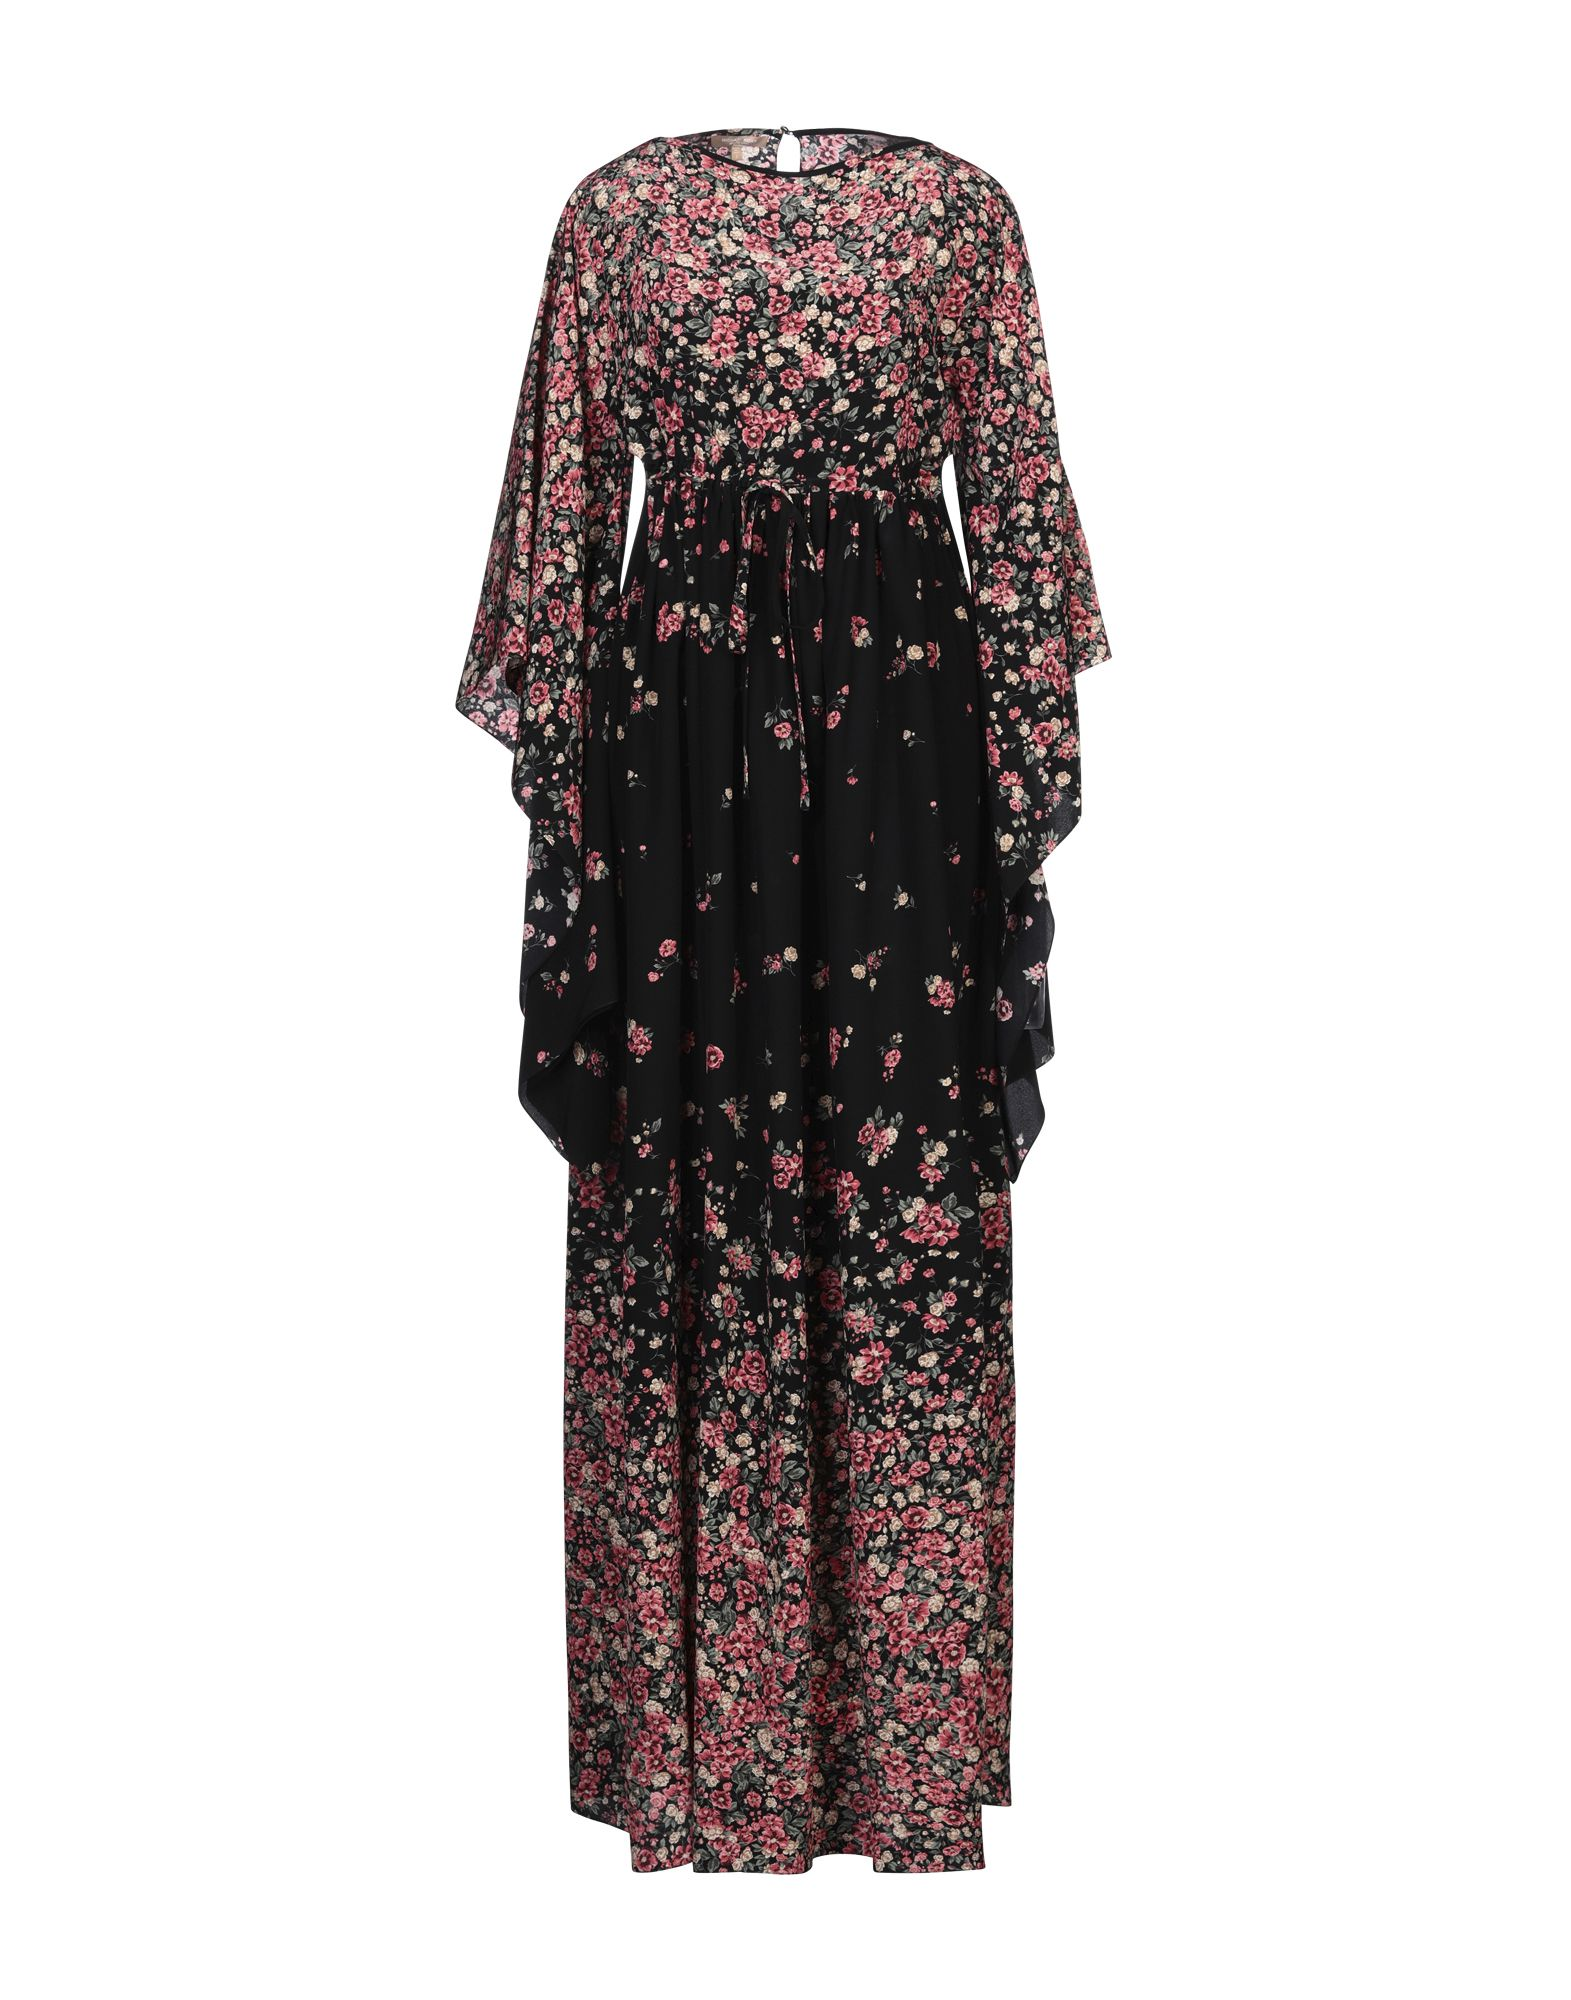 Фото - MICHAEL KORS COLLECTION Длинное платье michael kors collection длинное платье